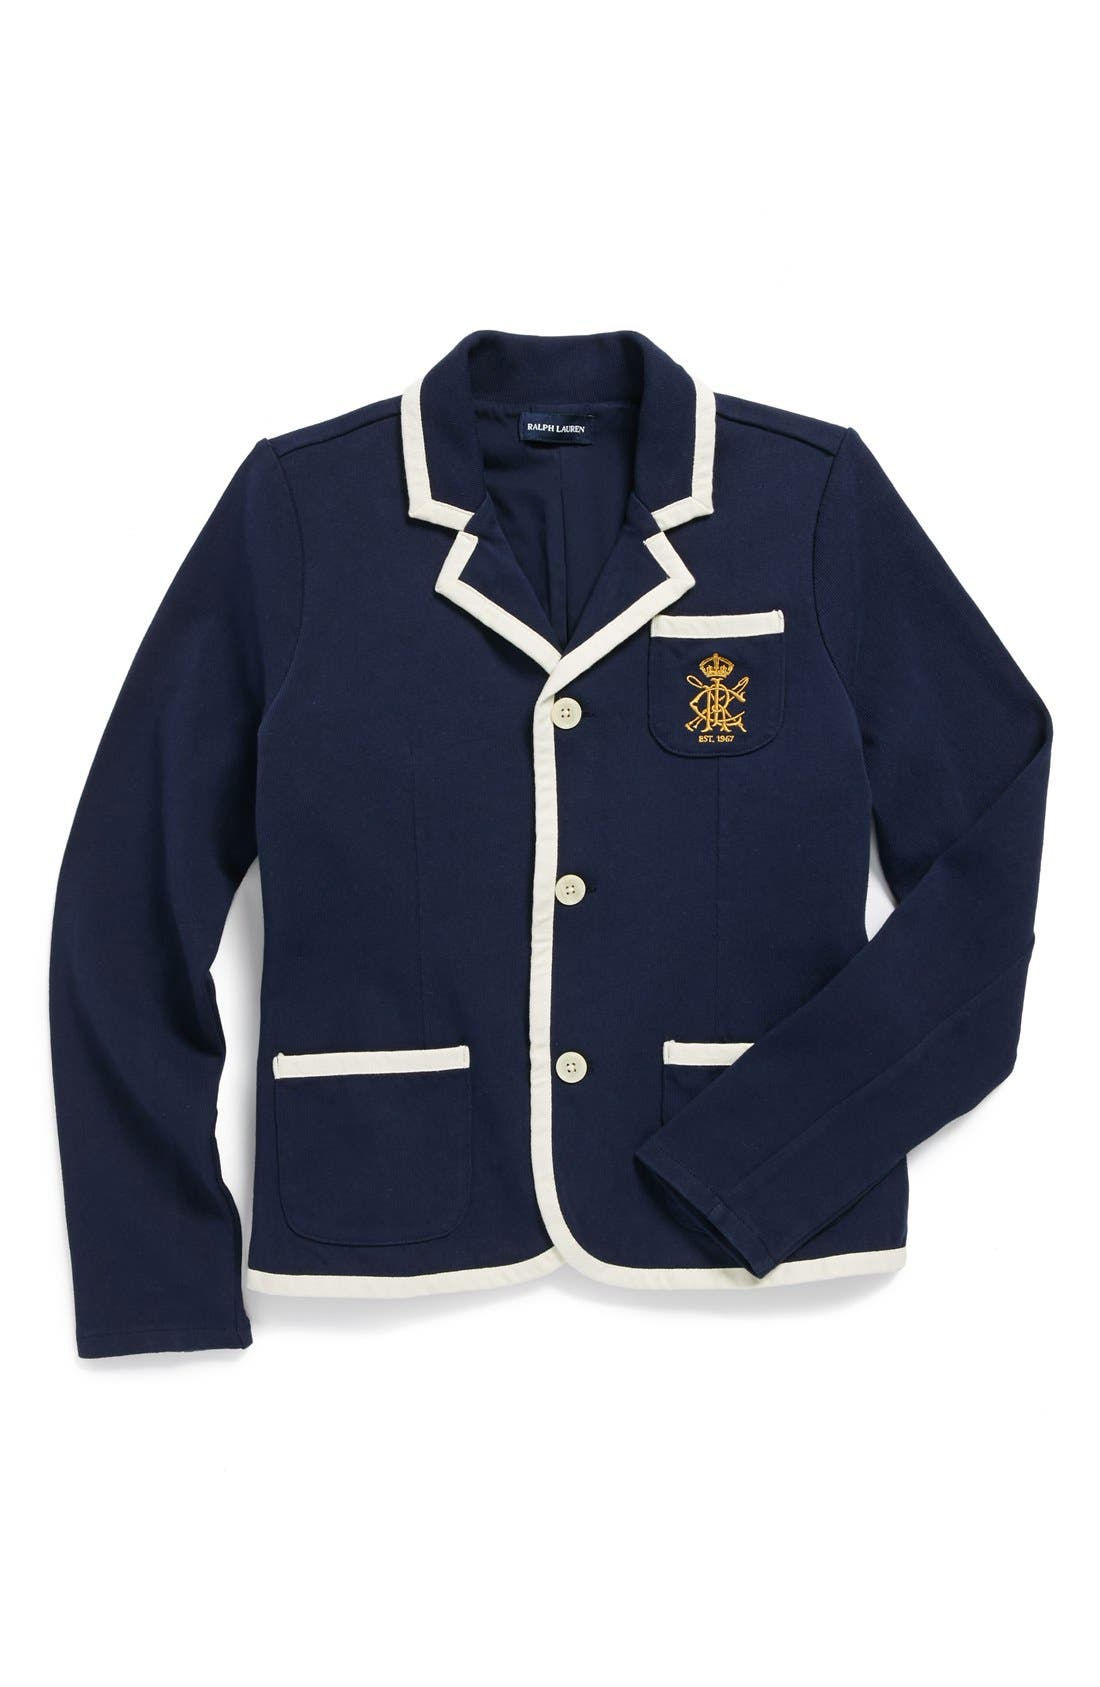 Main Image - Ralph Lauren Knit Jersey Blazer (Big Girls)